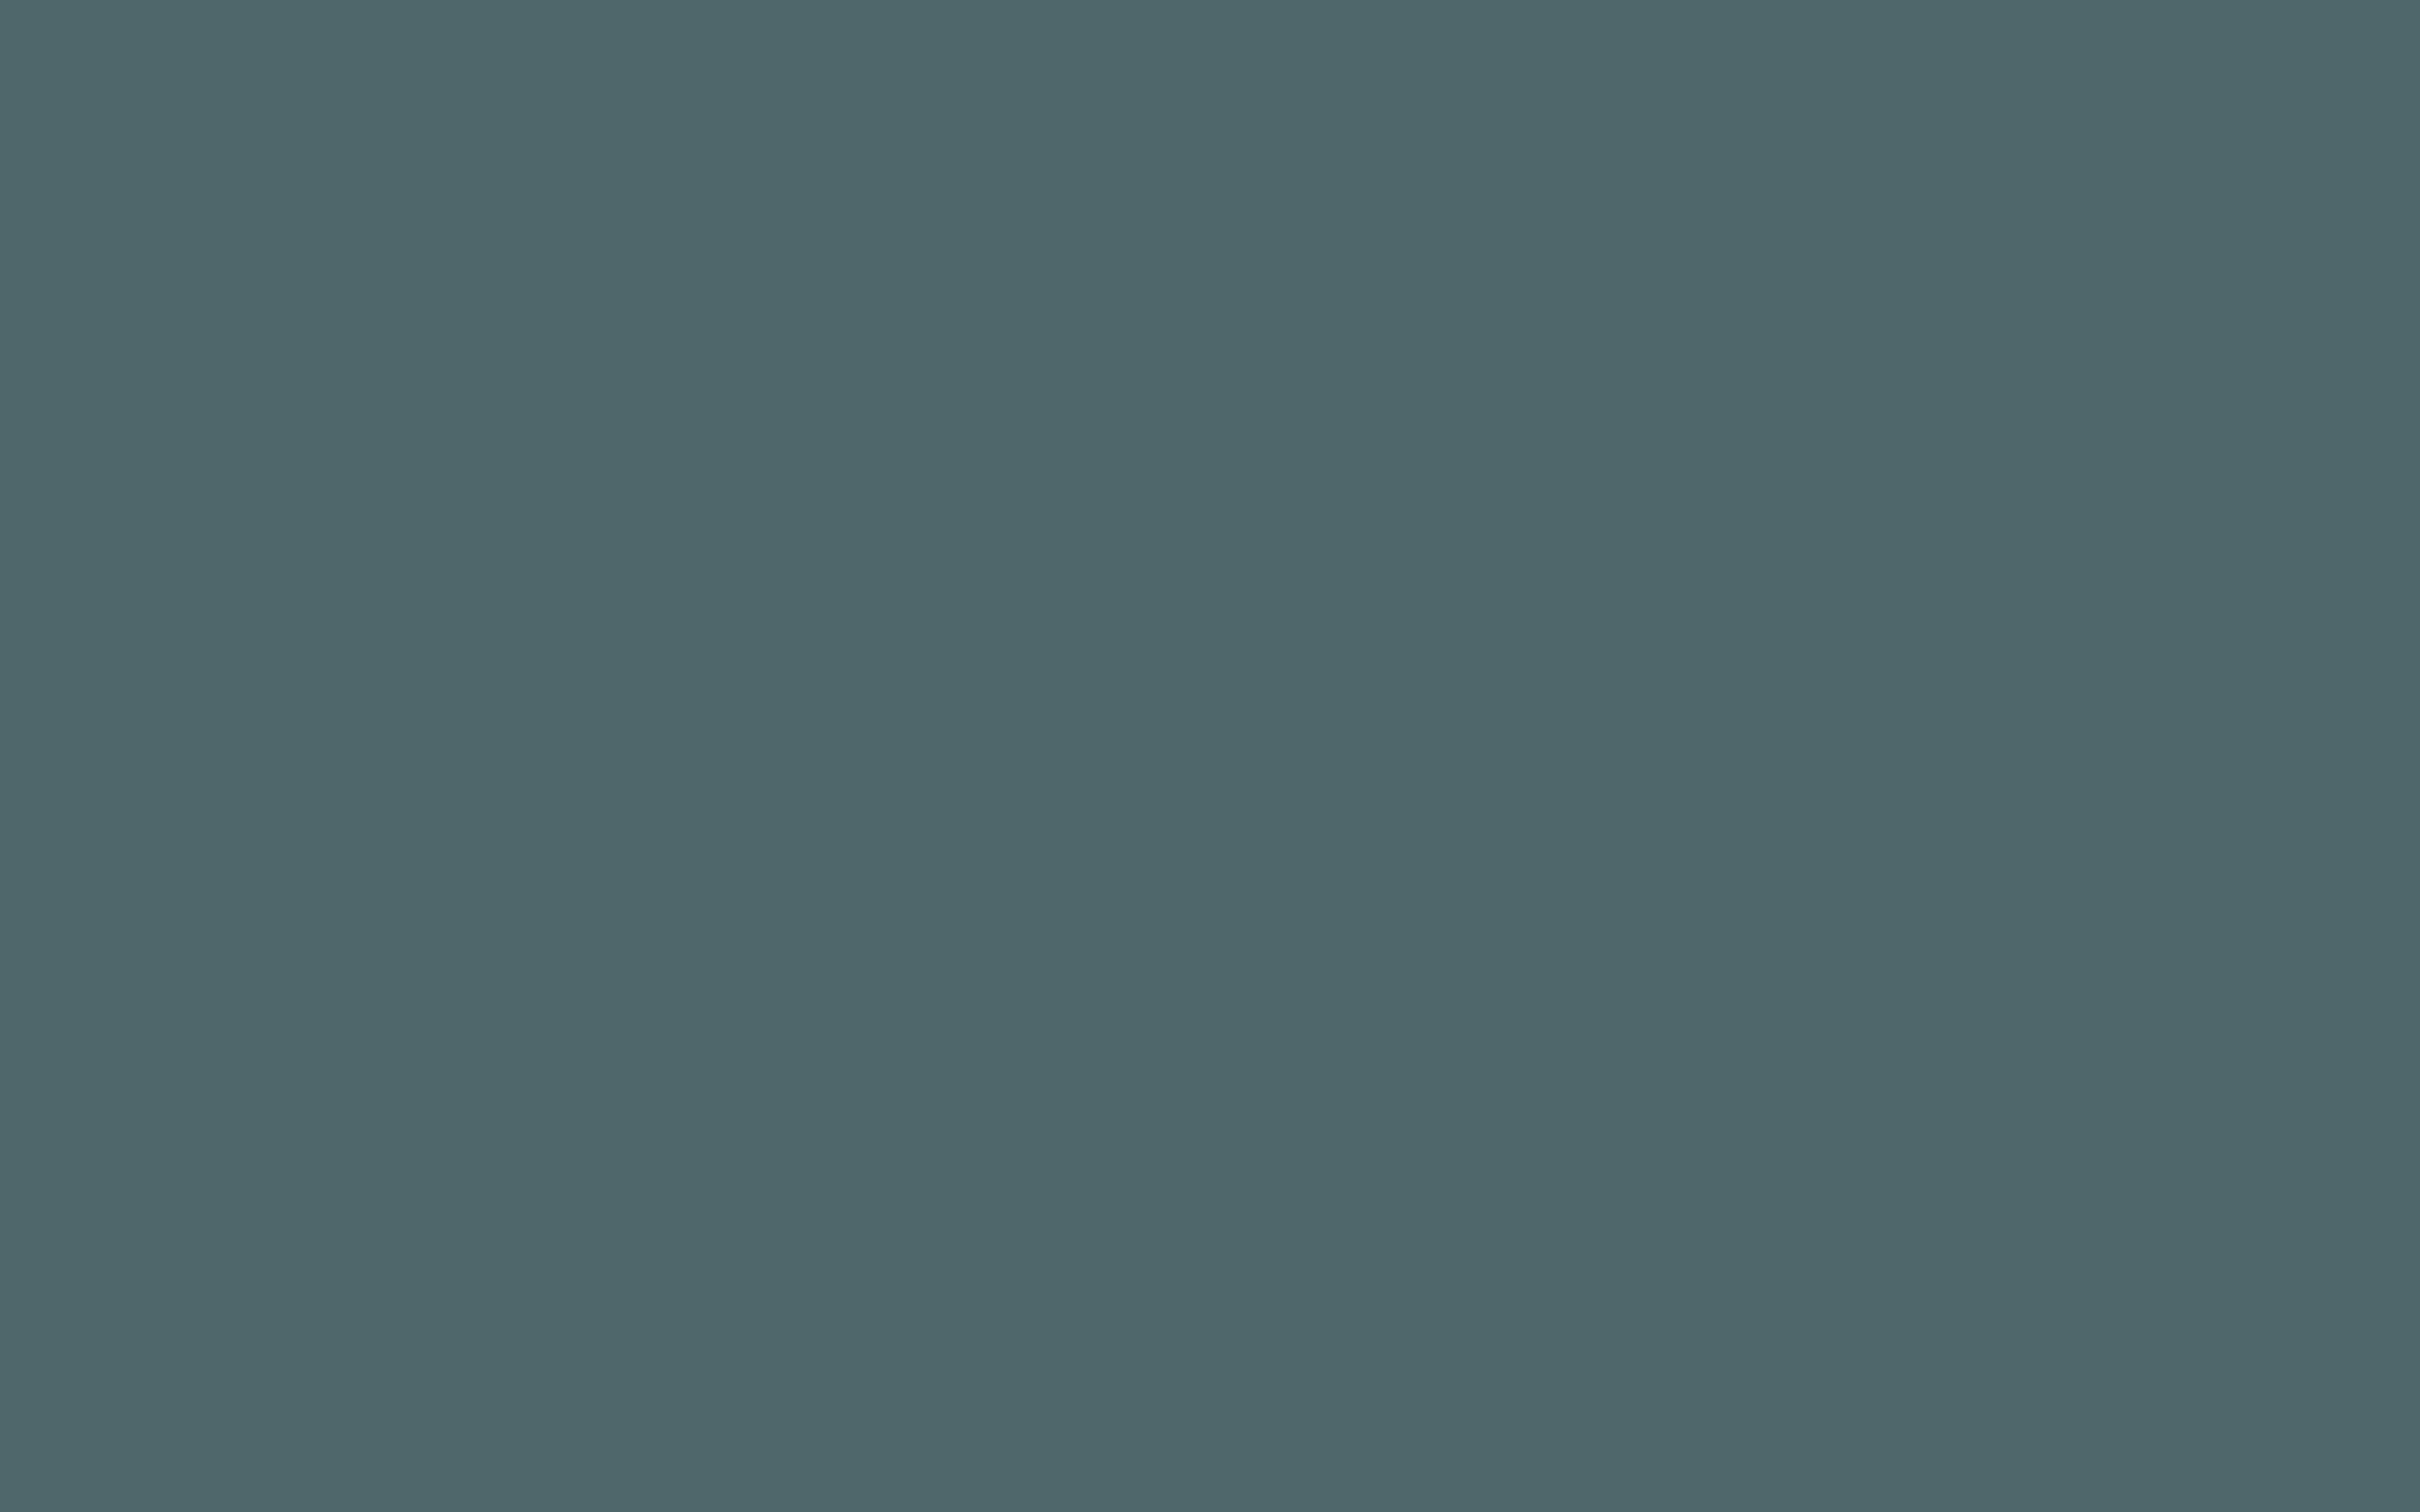 2560x1600 Stormcloud Solid Color Background